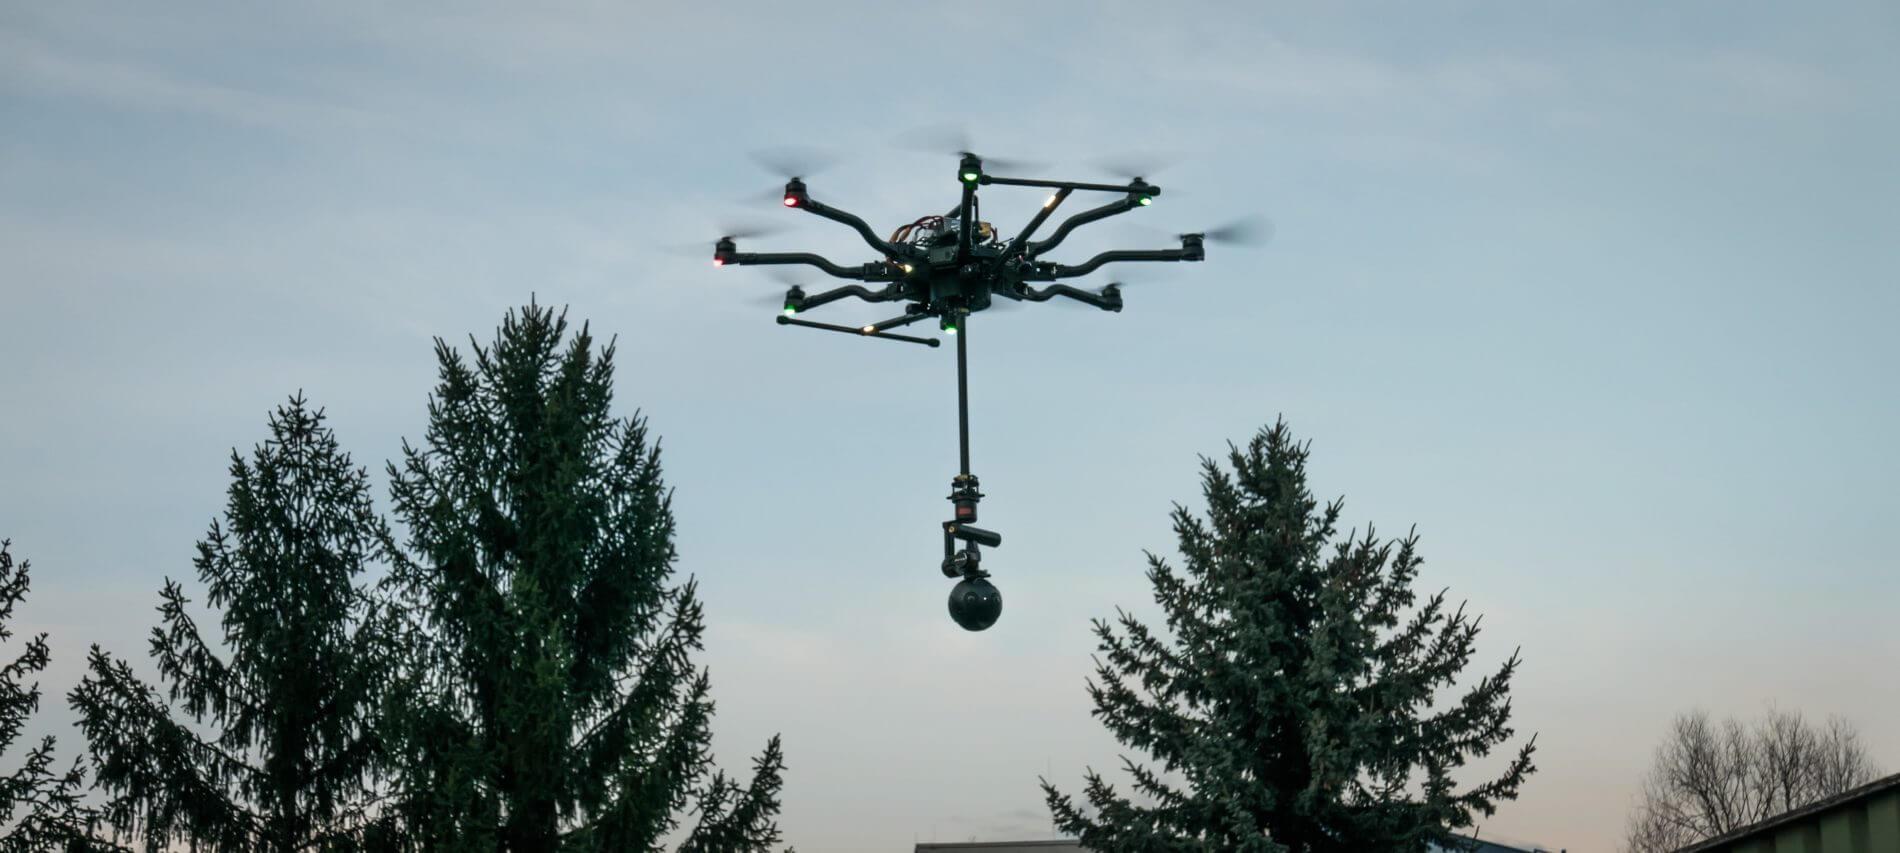 360-grad-VR-Aerial-360-grad-drone-virtual-reality-drone